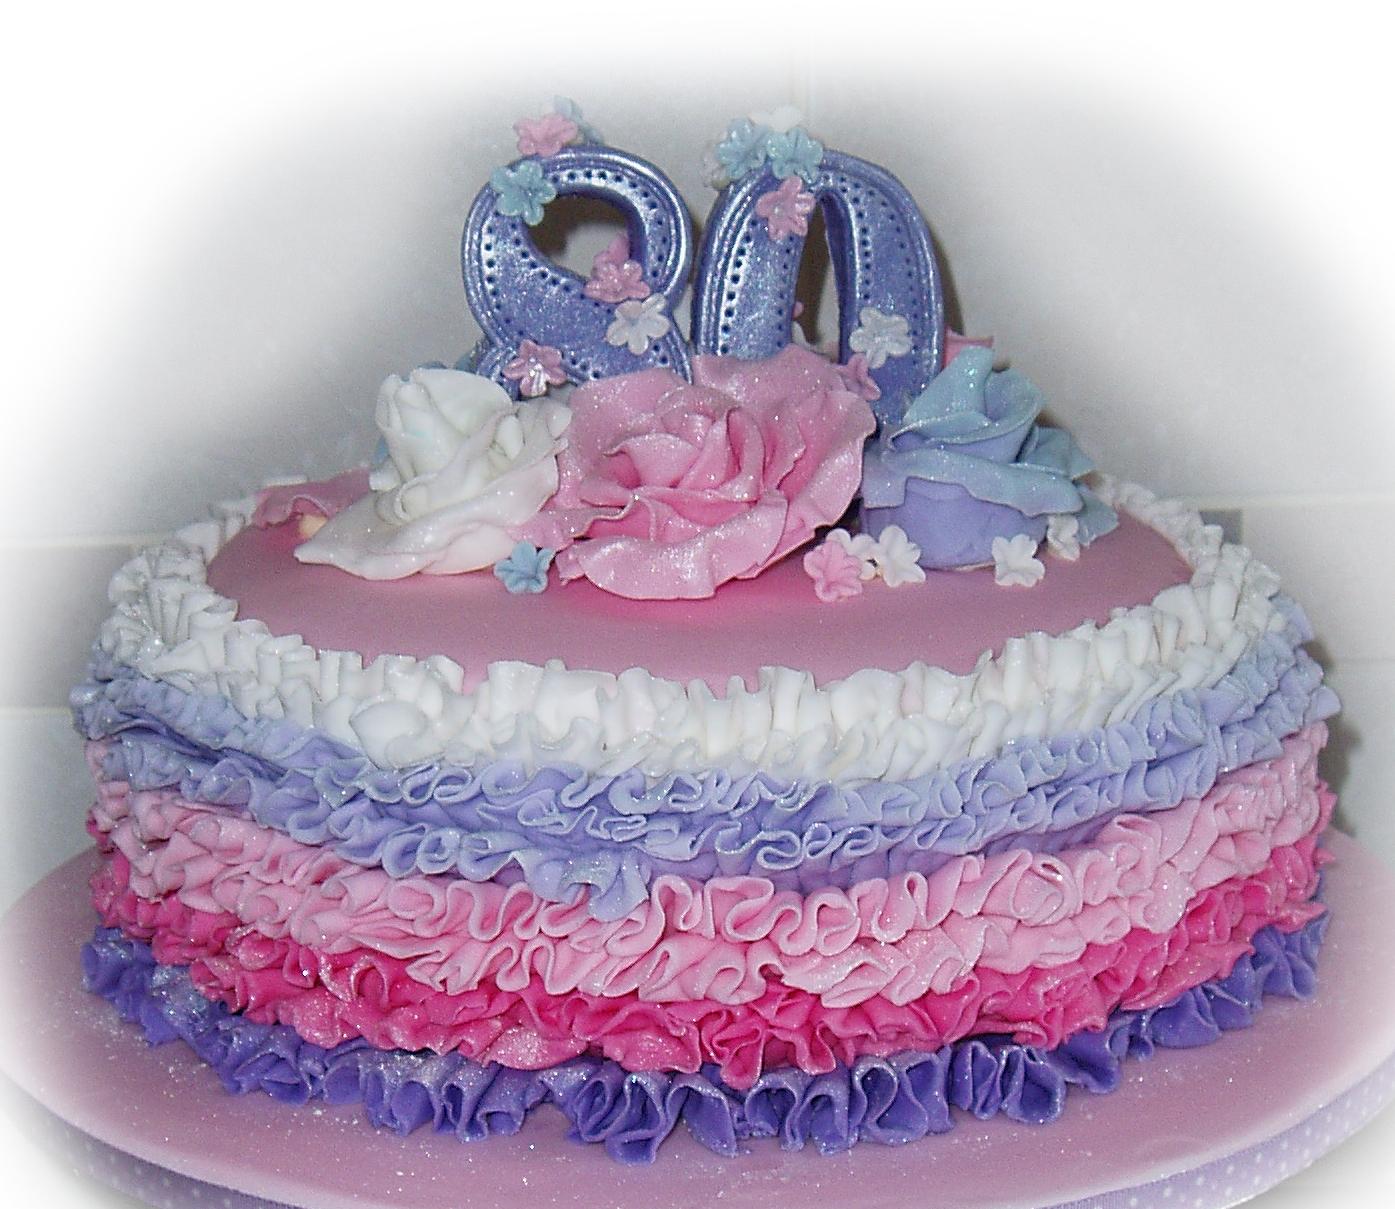 Ombre Ruffle Rose 80th Birthday Cake